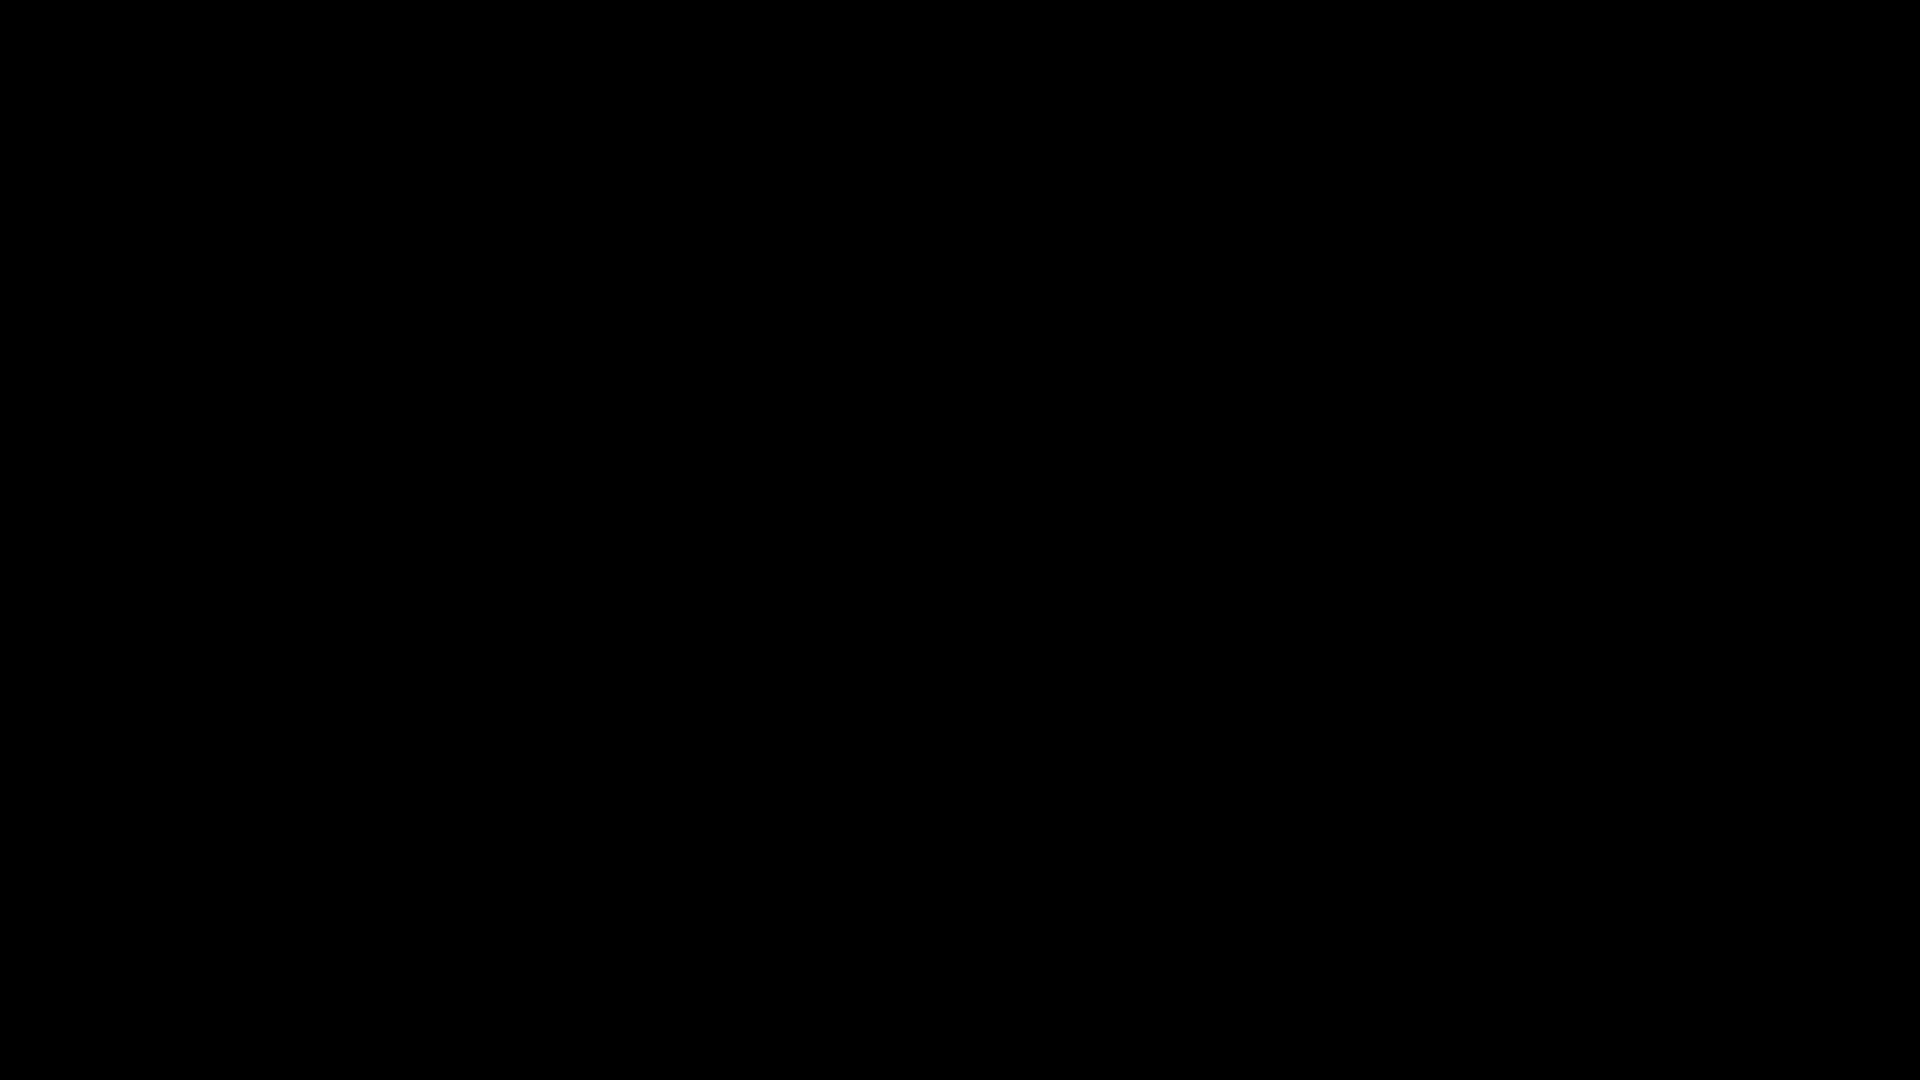 Societe des casinos chez fortune gambling